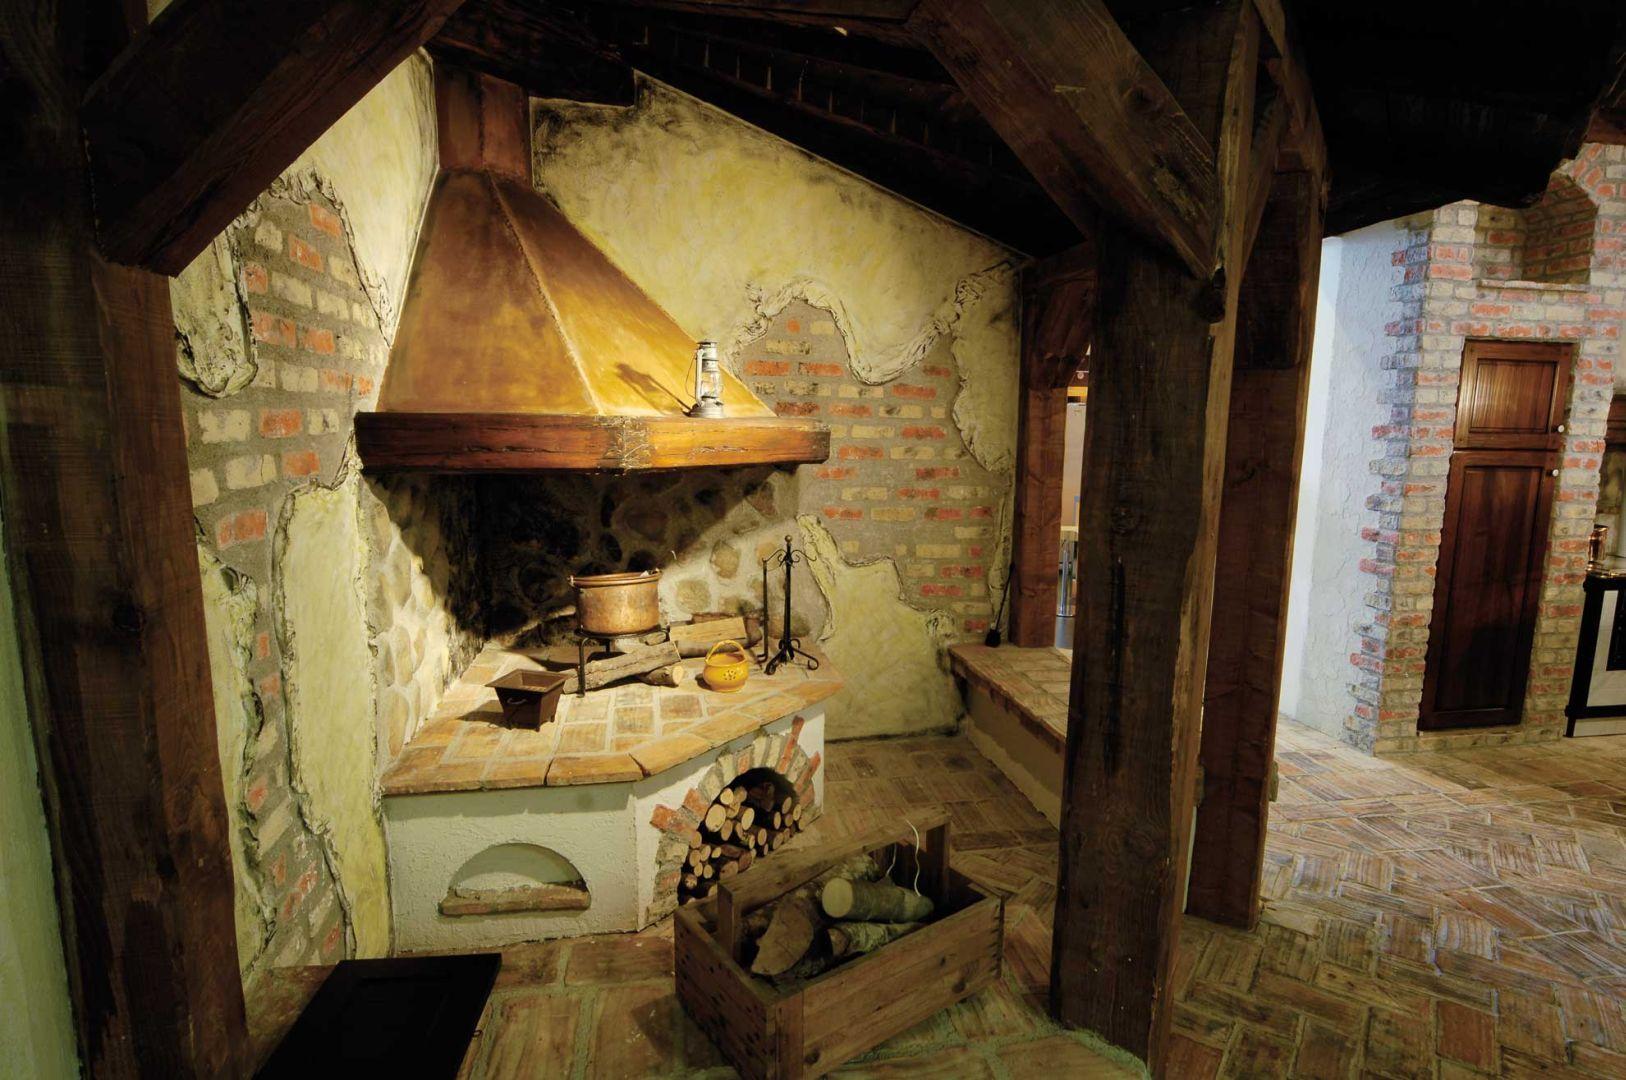 Borgo antico cucine a san marino cucine artigianali vicino rimini emilia romagna fireplaces - Cucine del borgo ...